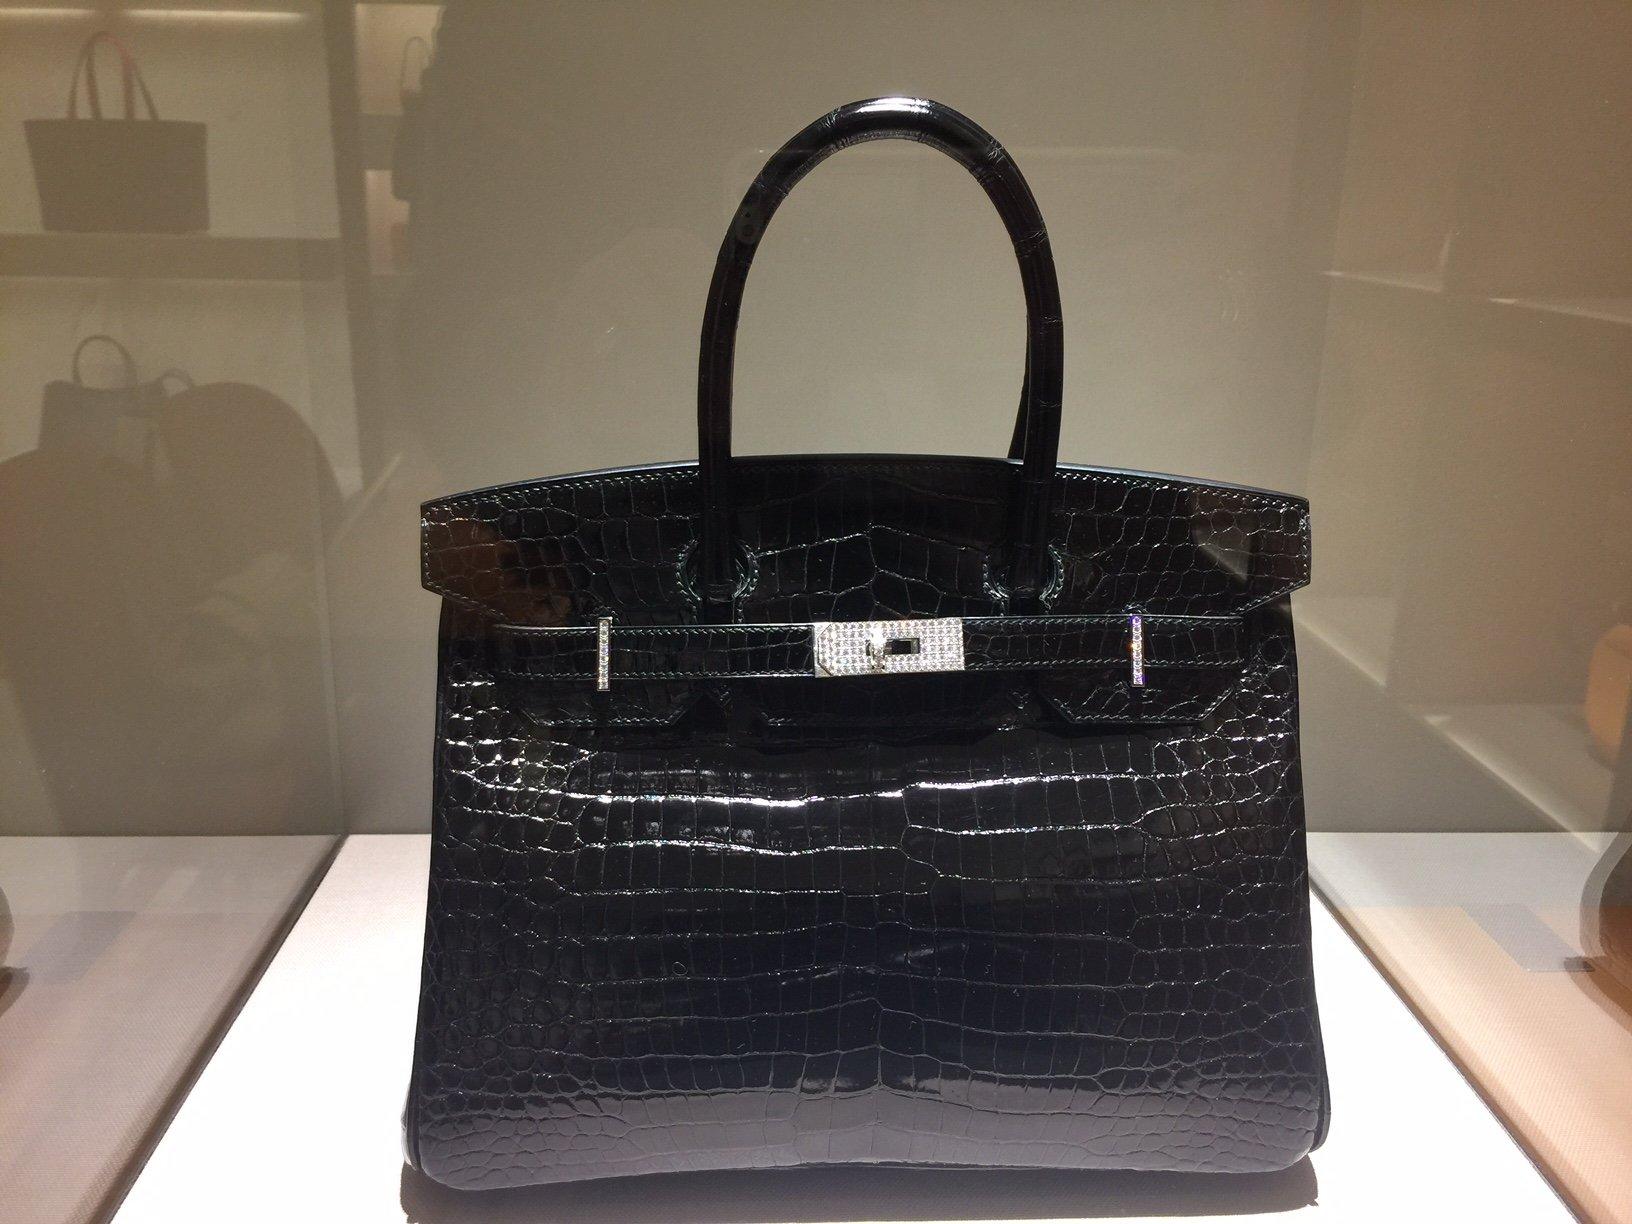 Borsa in coccodrillo Birkin di Hermès